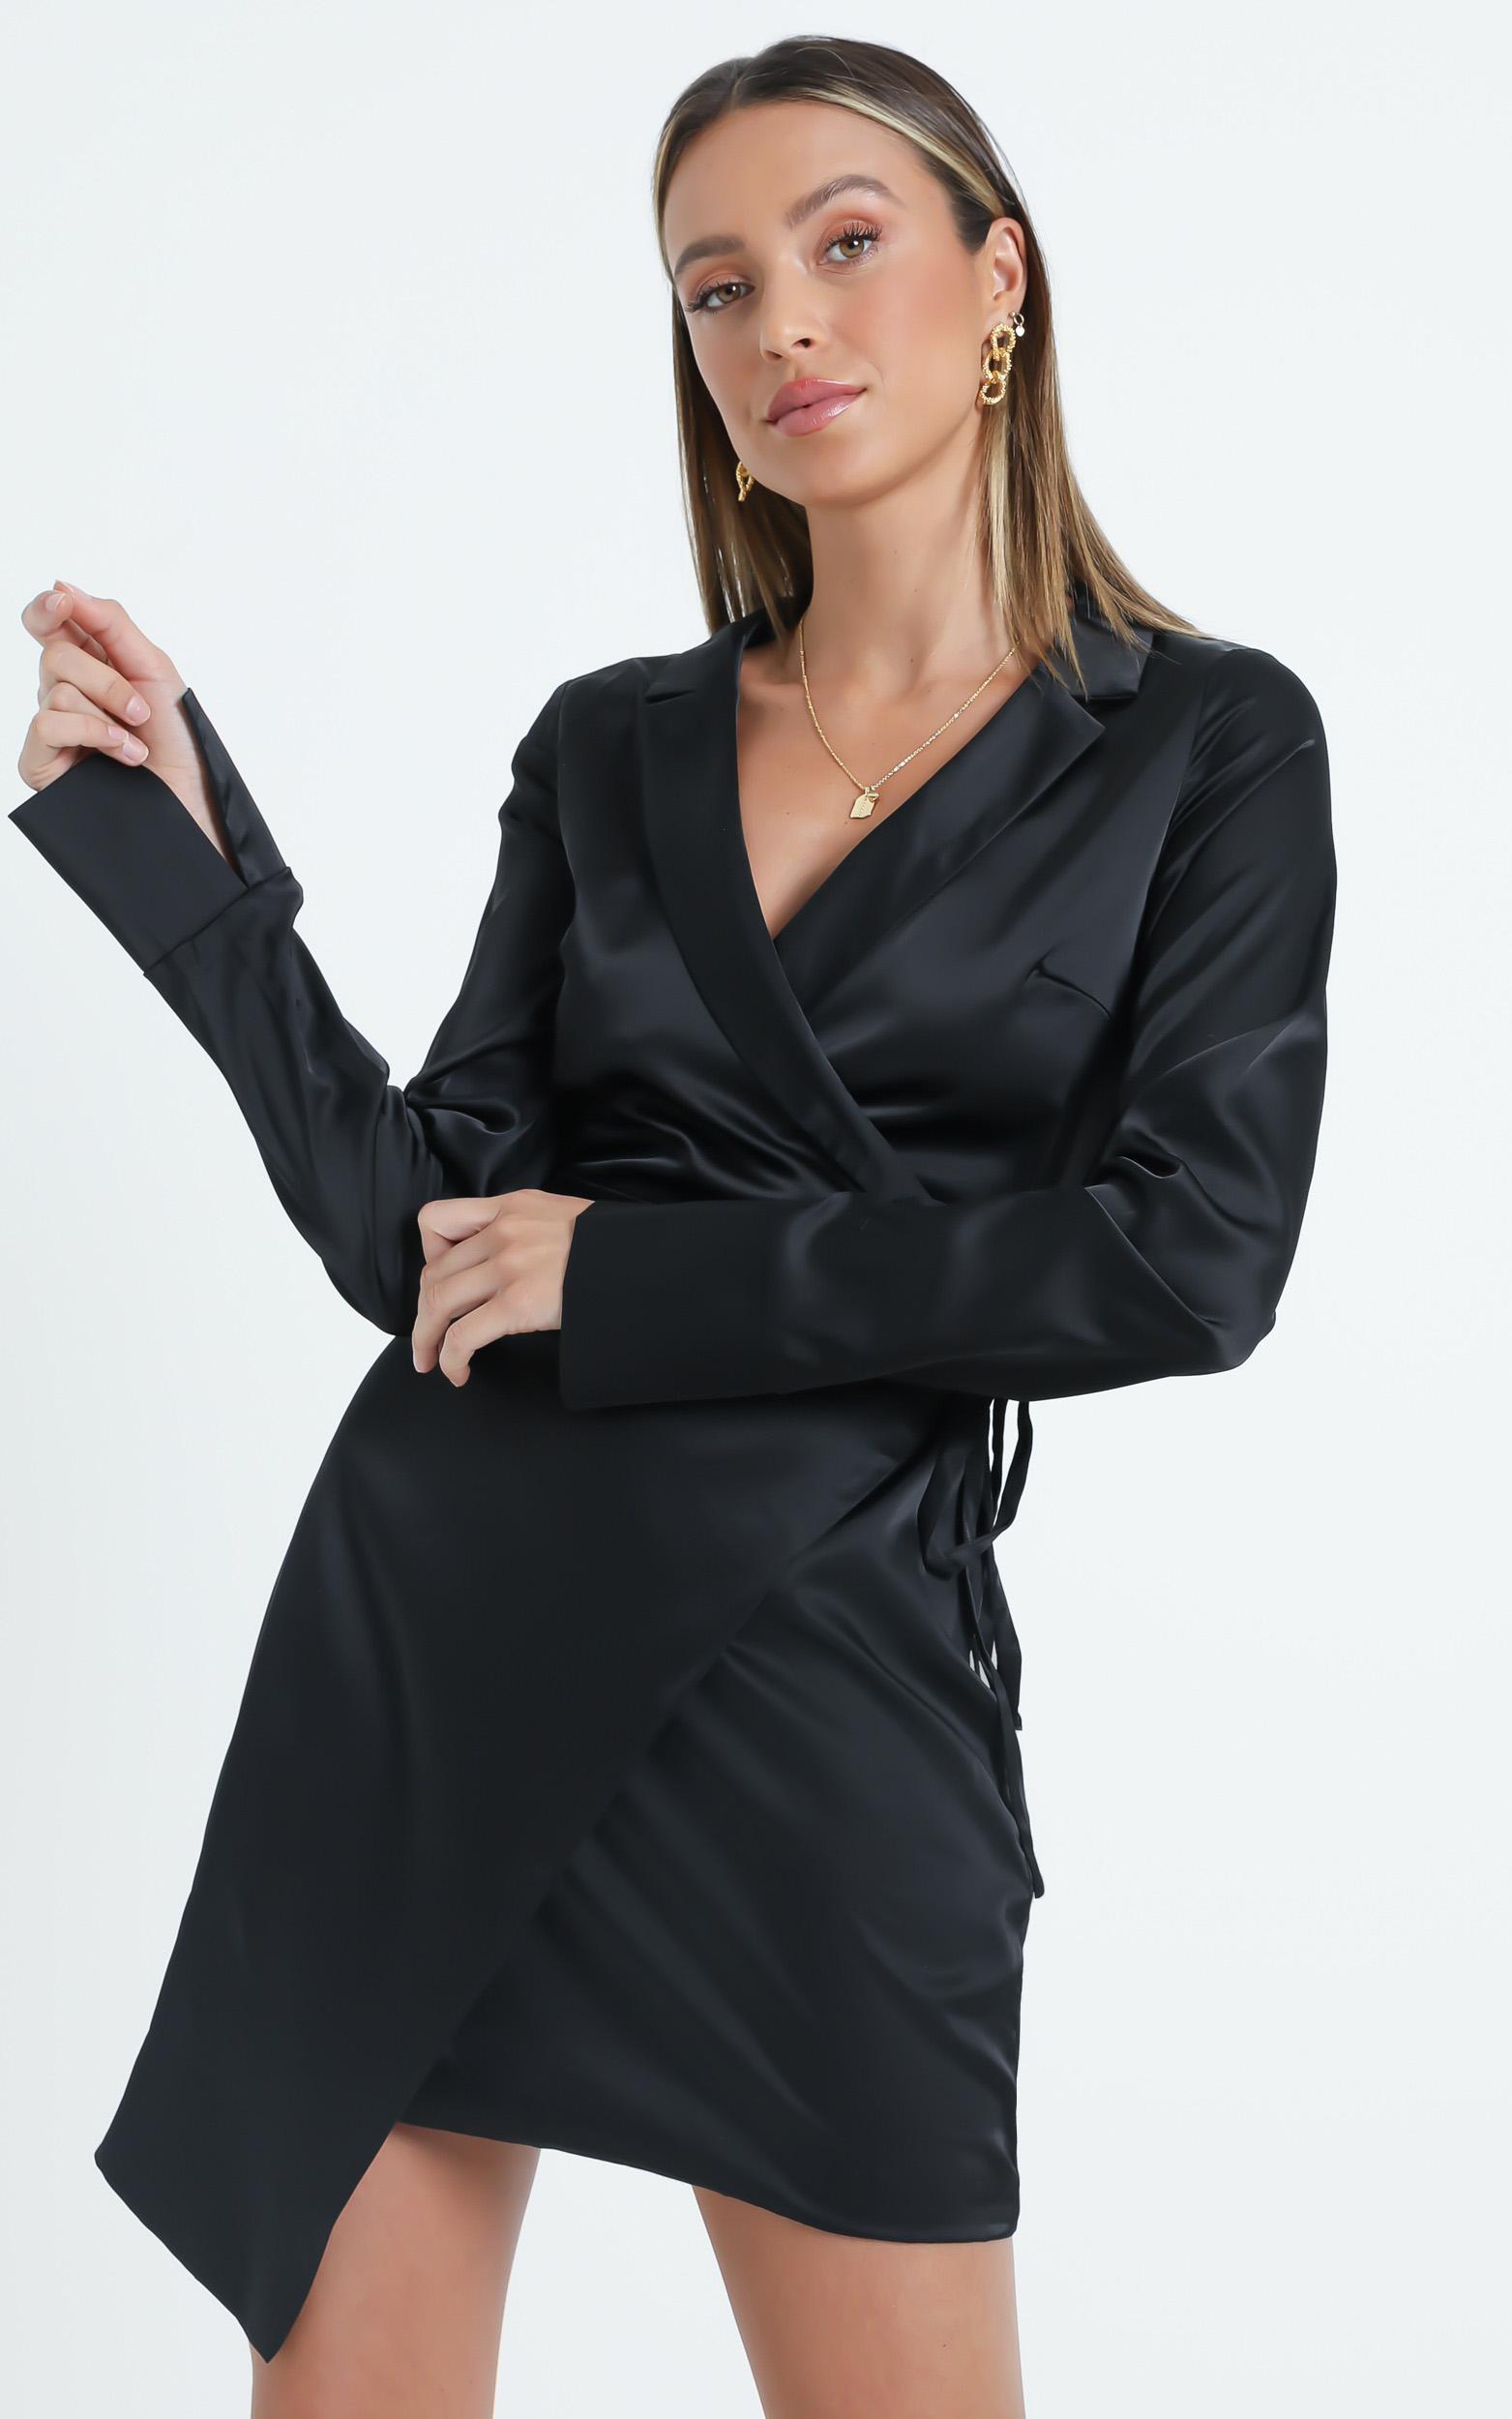 Loren Dress In Black Satin - 6 (XS), Black, hi-res image number null